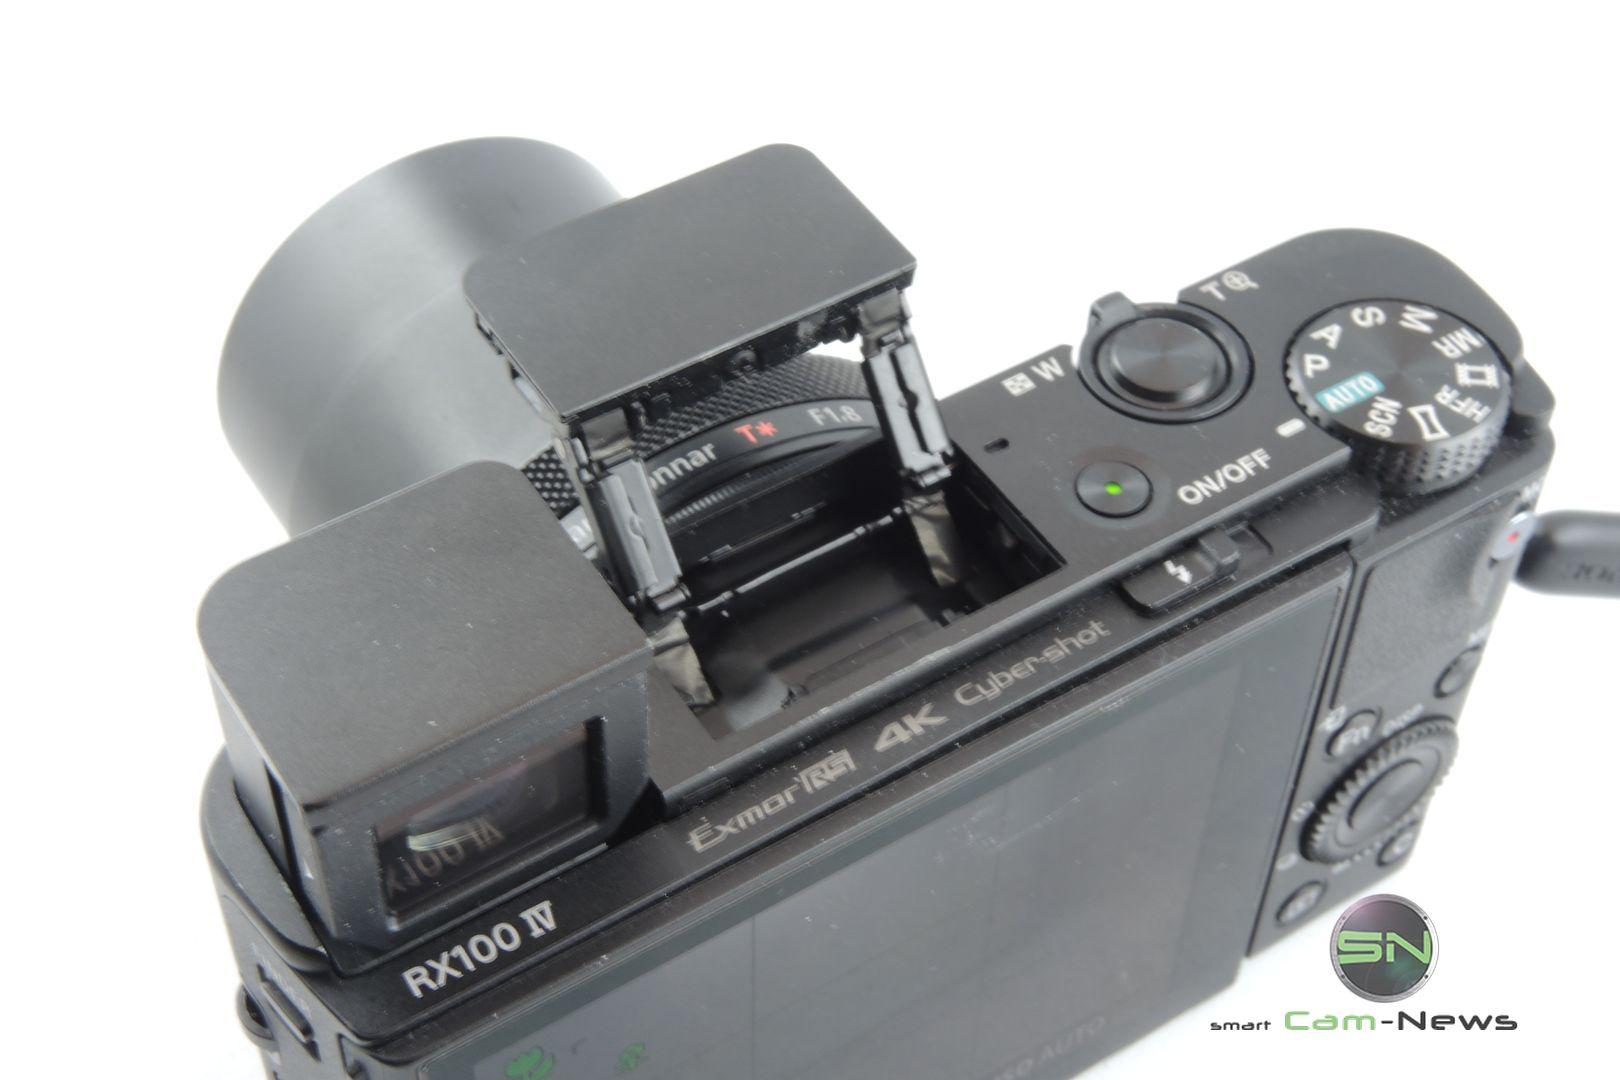 Sony RX100mIV die Luxus Kompakt Kamera